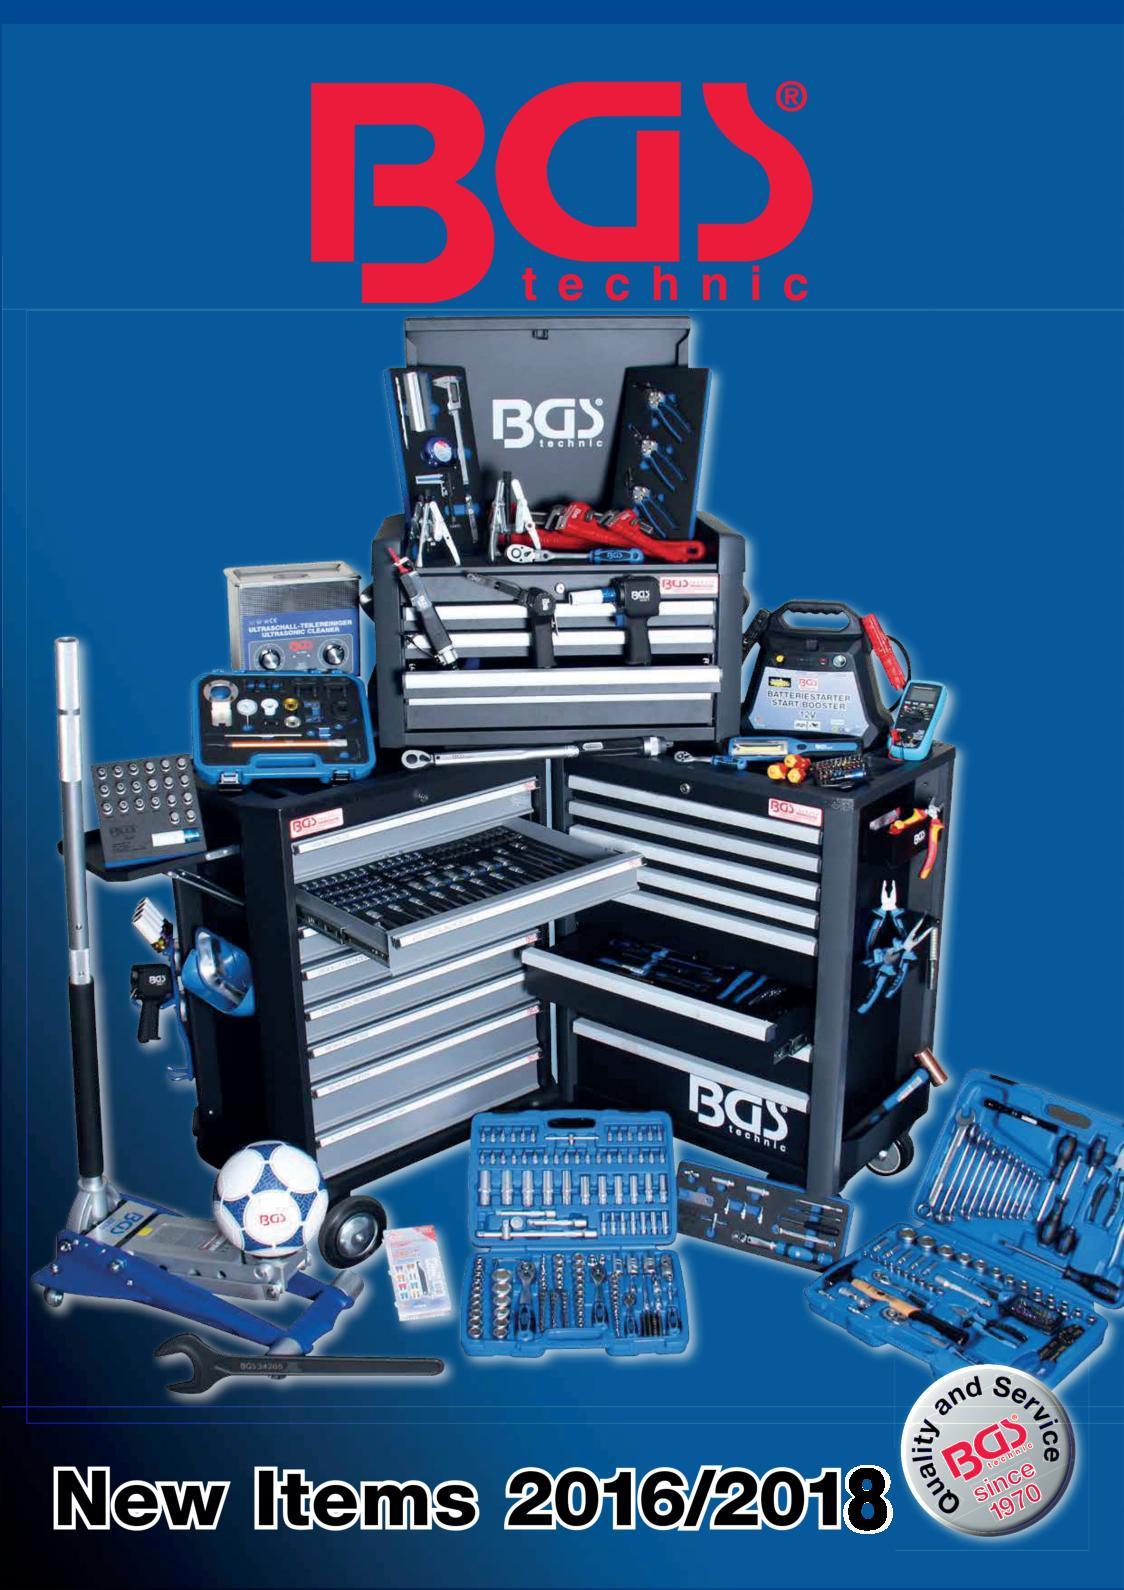 Calamo Bgs Noutati 2016 2018 Oem Usb Hub Mini Port Pcb Circuit Board Buy Minimini